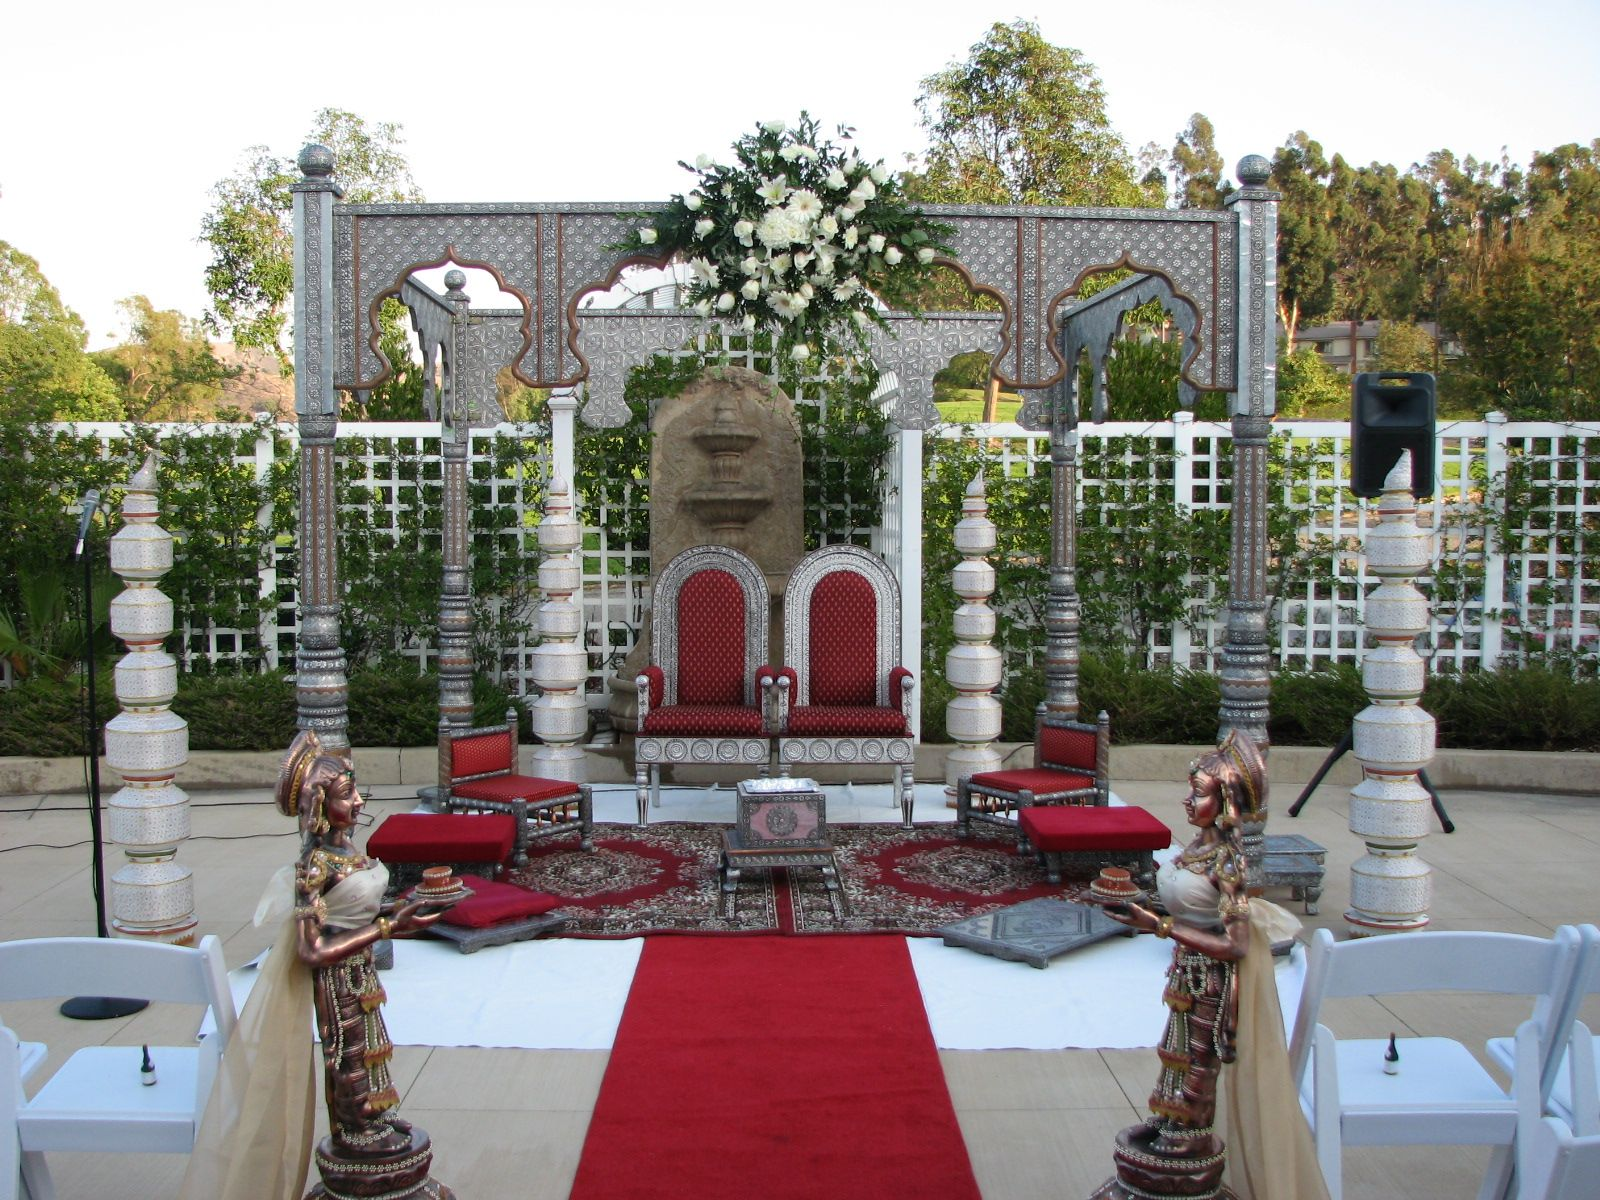 Wedding mandap decoration images  Outdoor mandap  Wedding Ceremonies  decor  Pinterest  Wedding